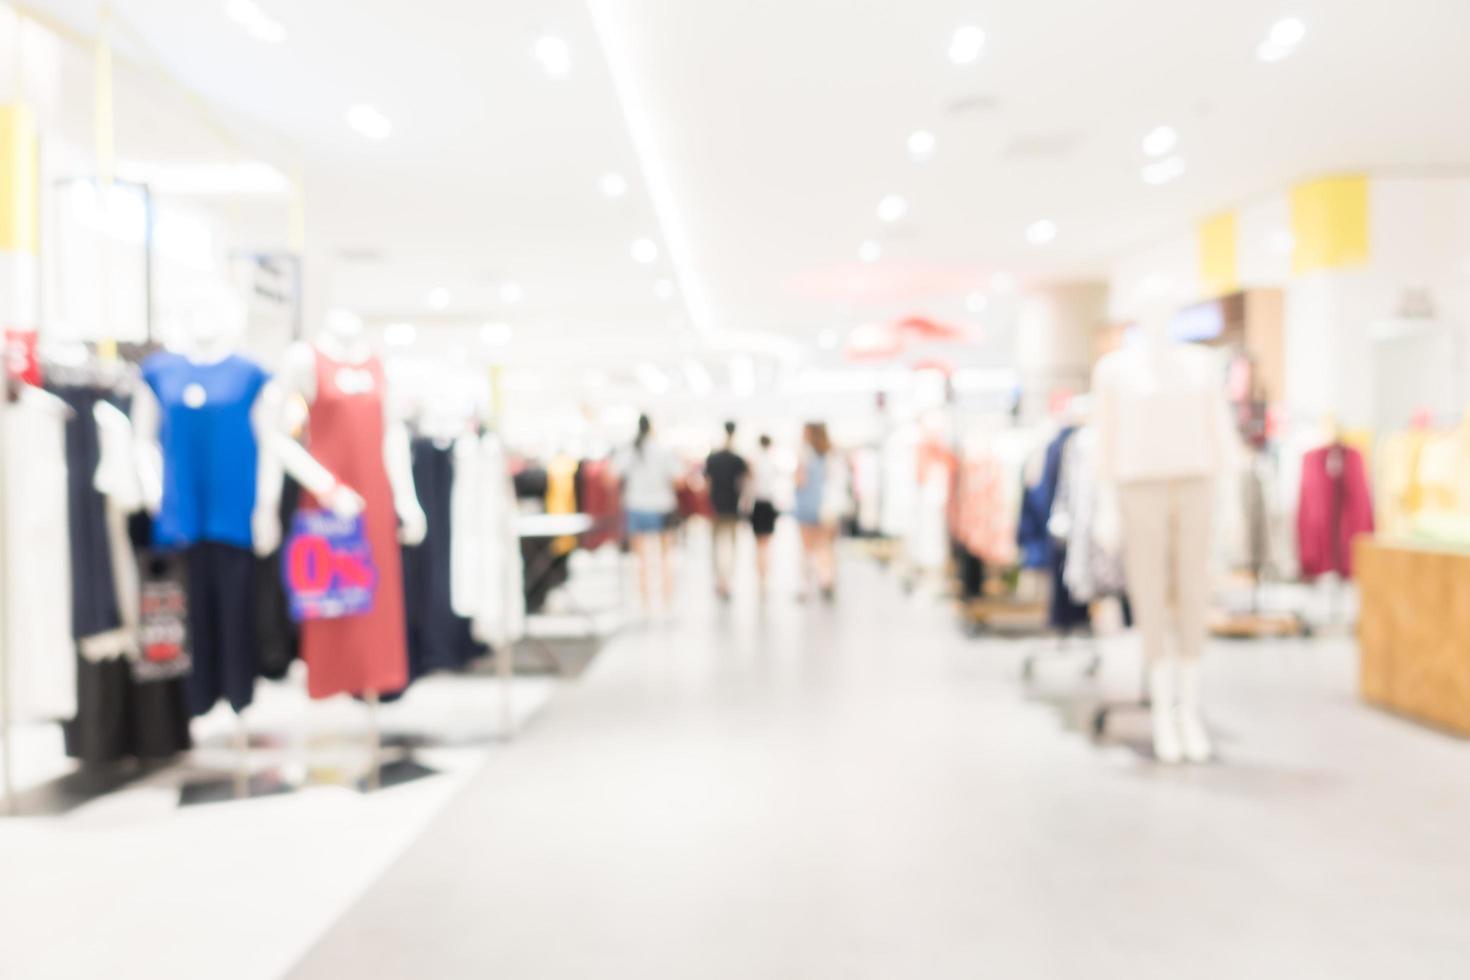 abstracte intreepupil winkelcentrum achtergrond foto